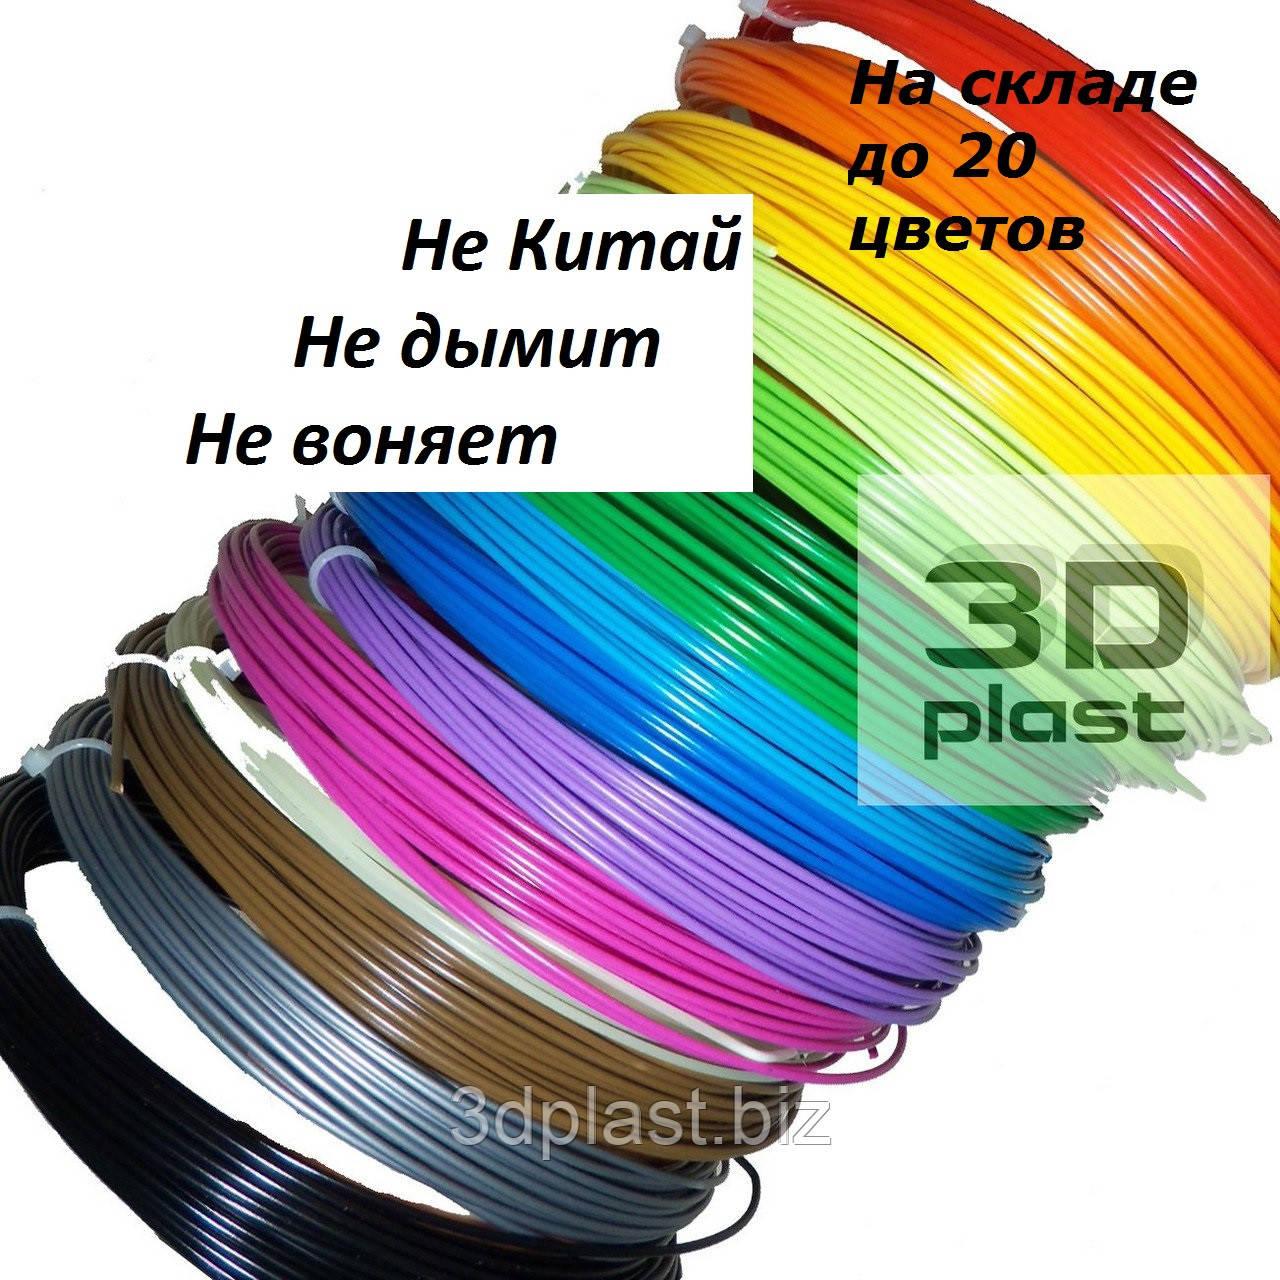 АБС пластик, заряд для 3D ручки, мотки по 10 м